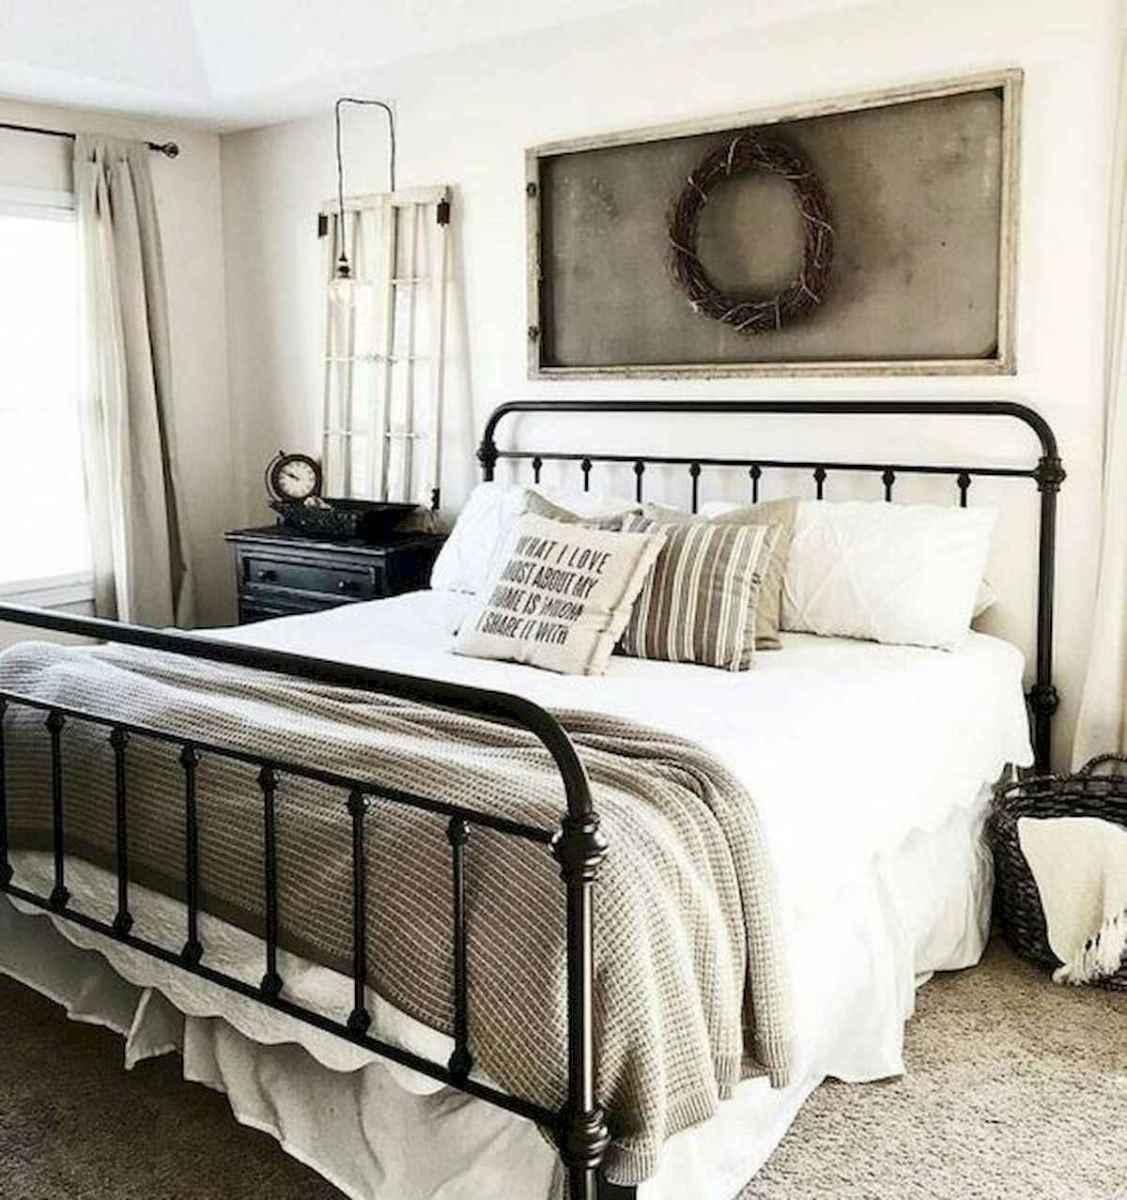 50 Favorite Bedding for Farmhouse Bedroom Design Ideas and Decor (4)